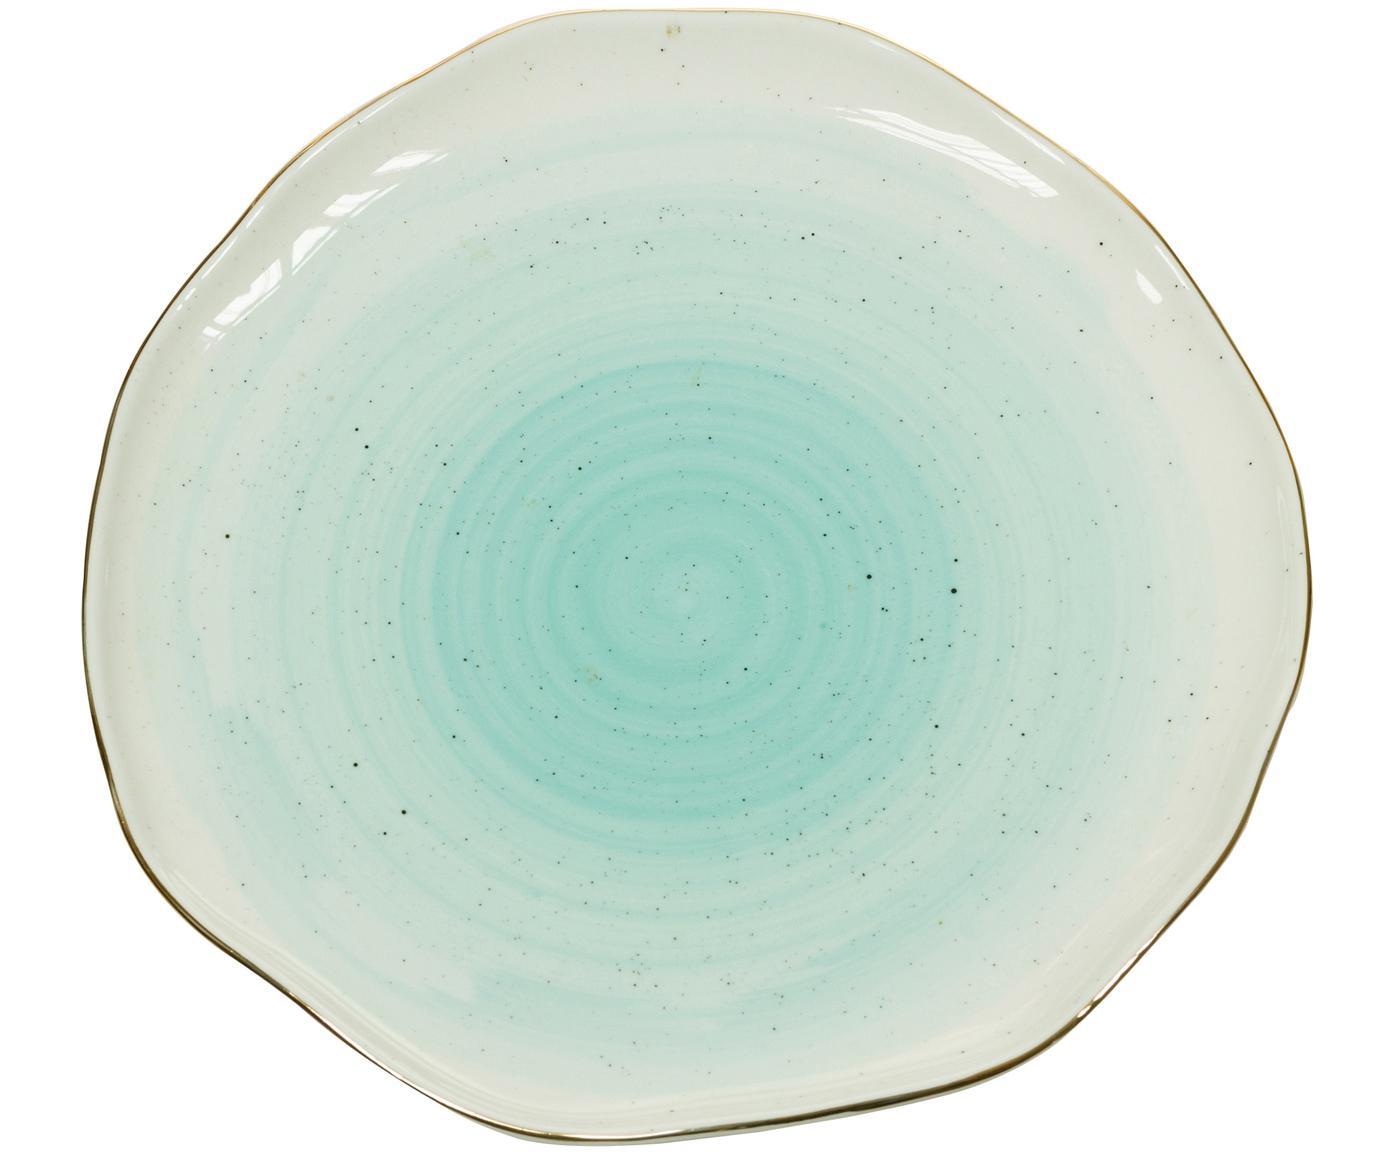 Planos llanos artesanales Bol, 2uds., Porcelana, Azul turquesa, Ø 26 x Al 3 cm